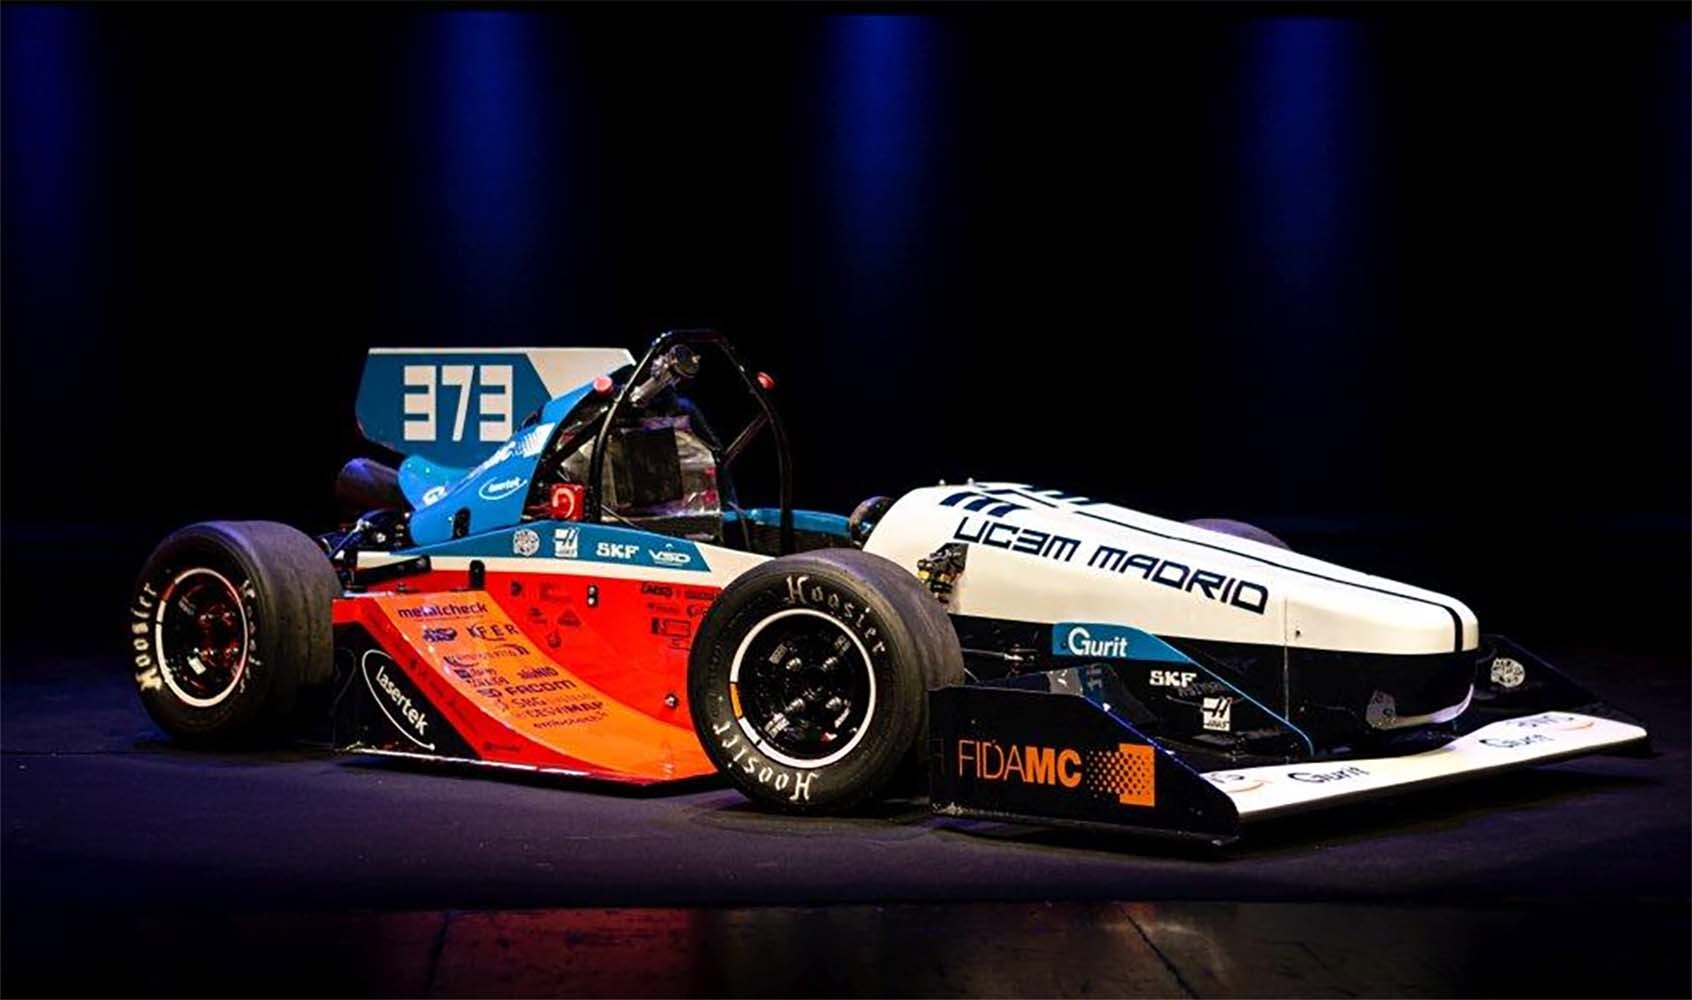 Fórmula 1 de los estudiantes